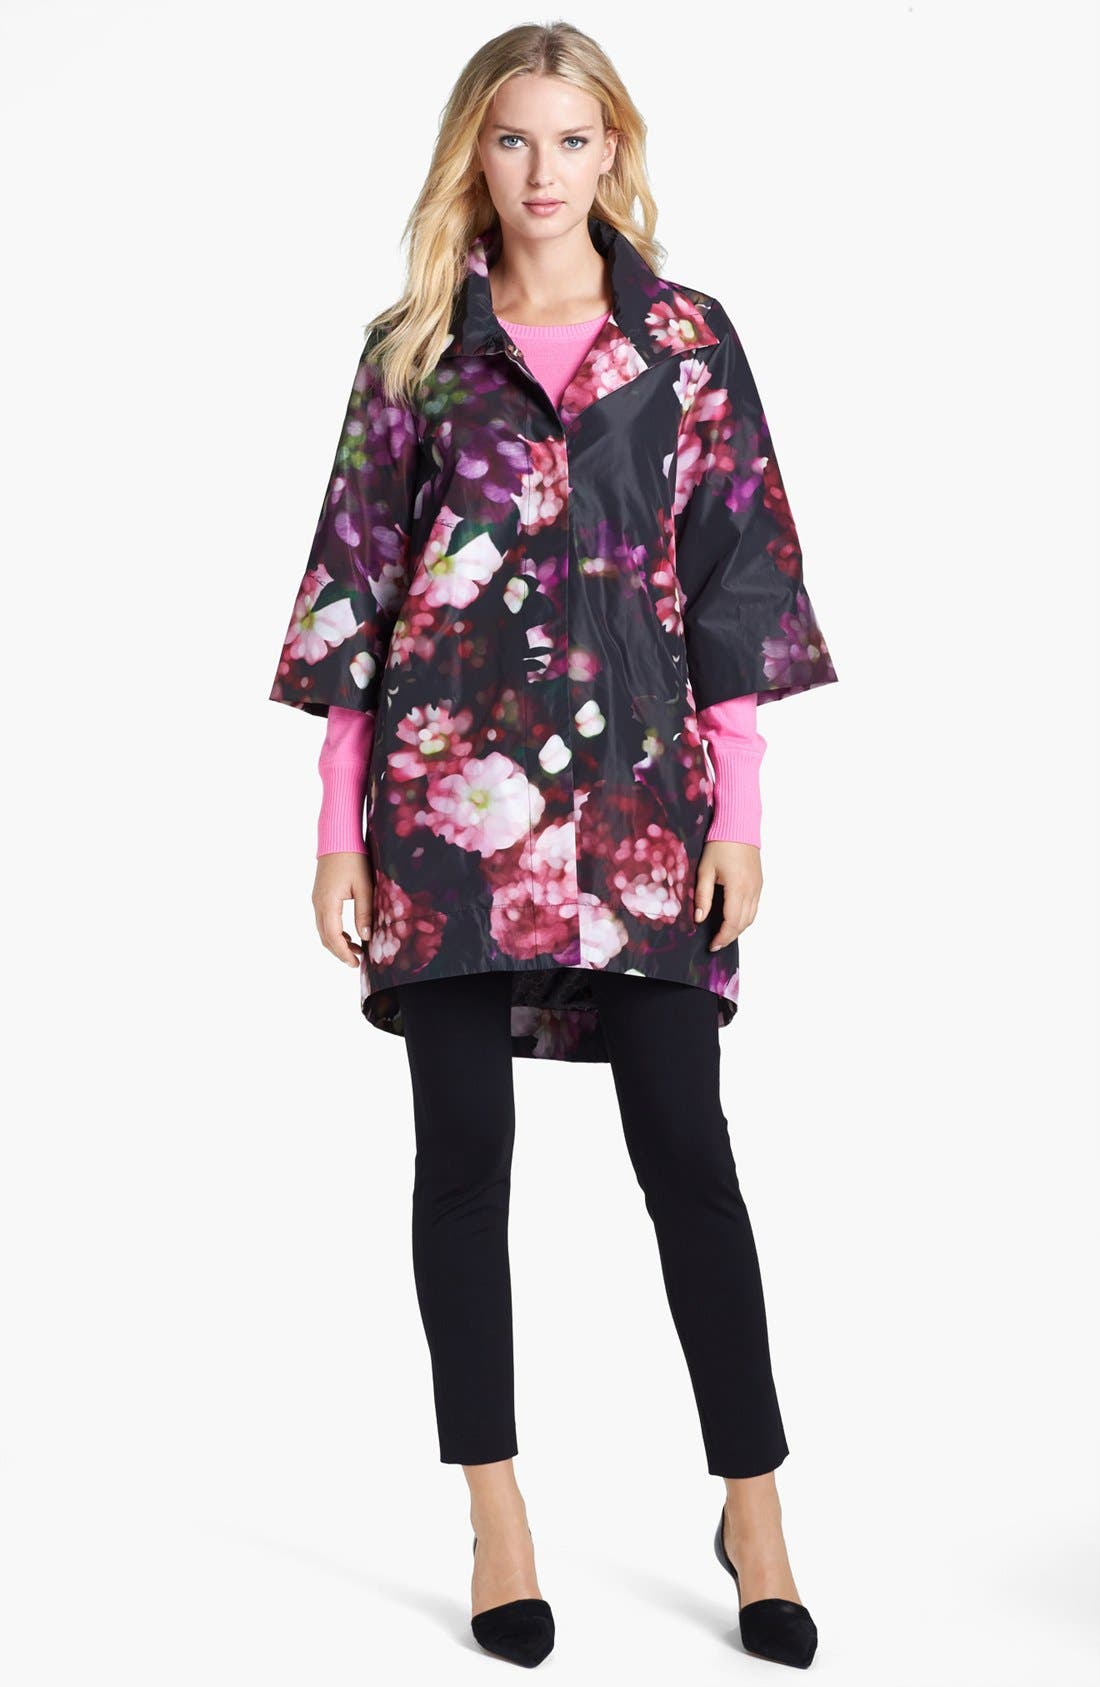 Alternate Image 1 Selected - Pink Tartan Swing Coat & Cashmere Sweater, Elie Tahari Knit Pants